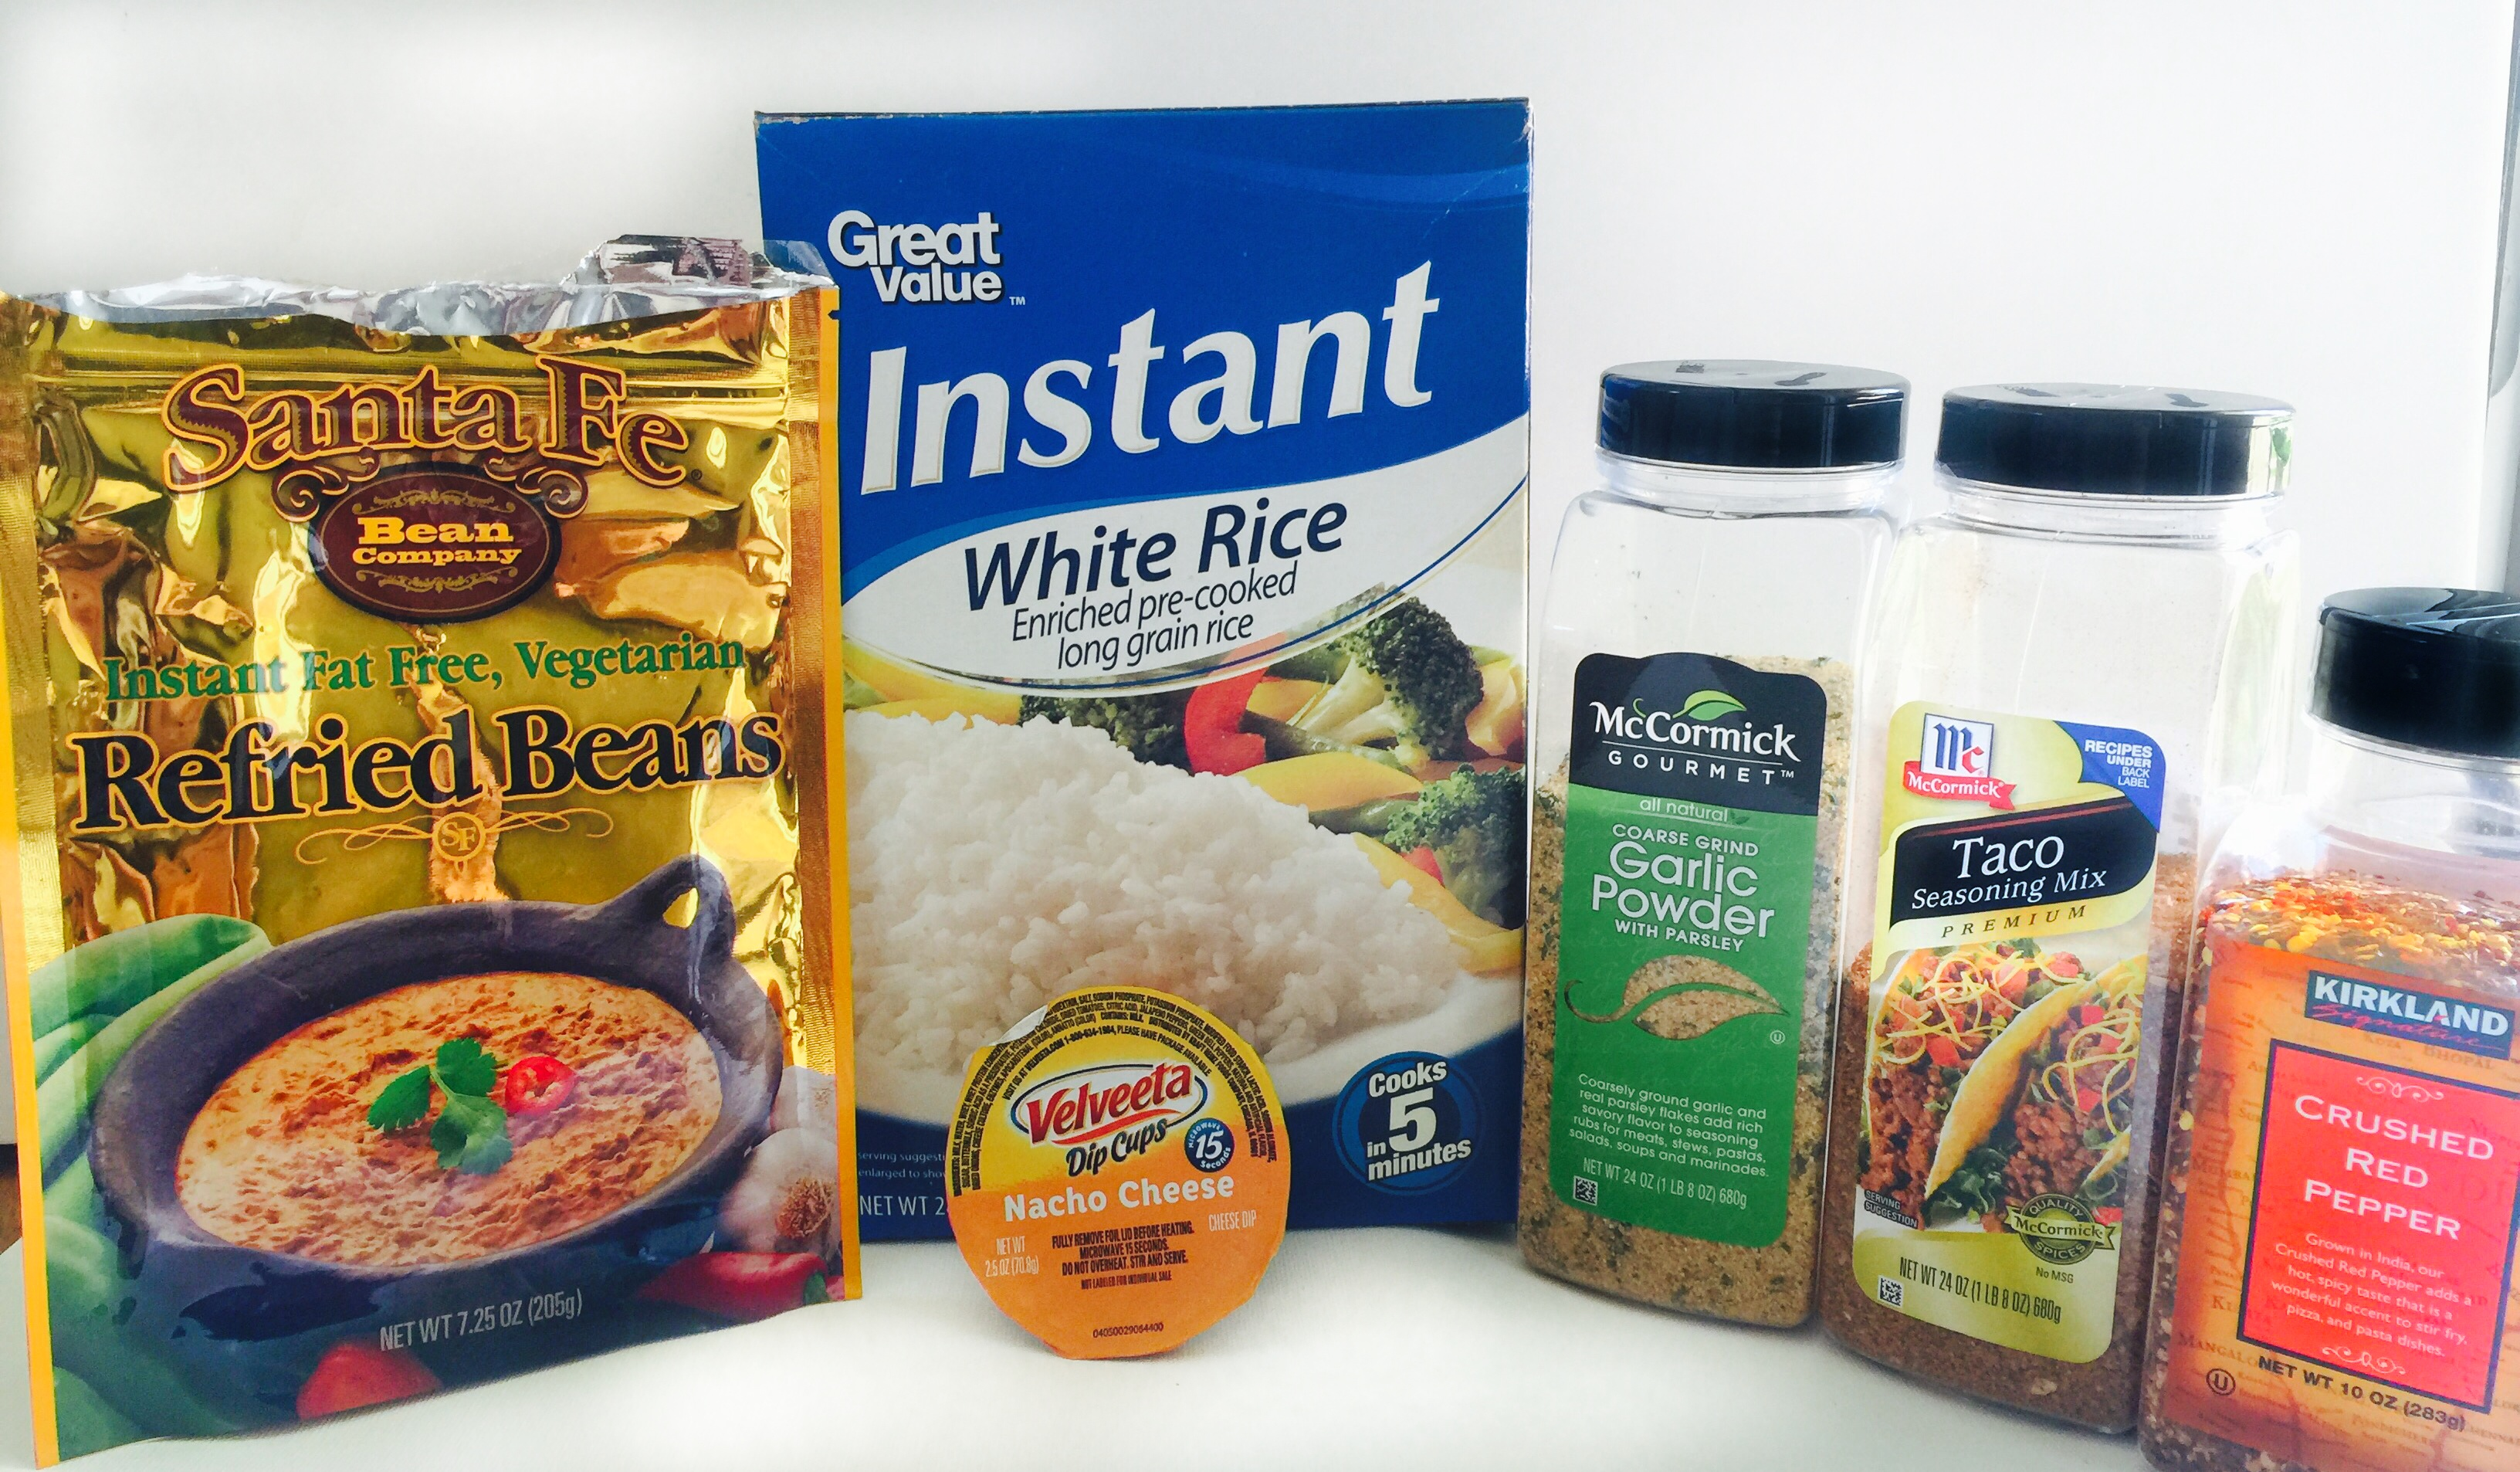 Santa Fe Rice and Beans